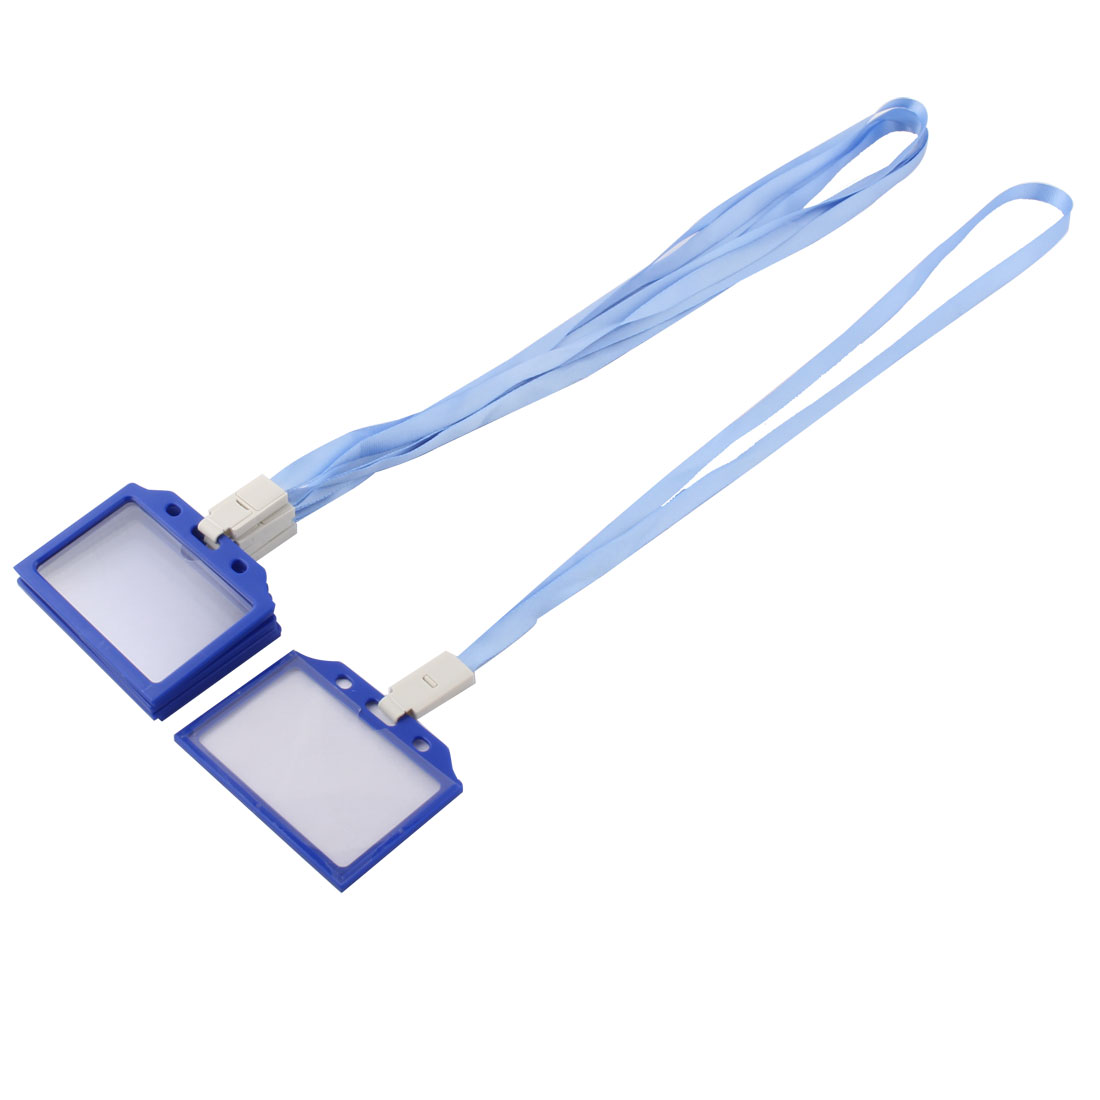 Office Neck Strap Band Lanyard Working Employee ID Card Holder Light Blue 5 Pcs